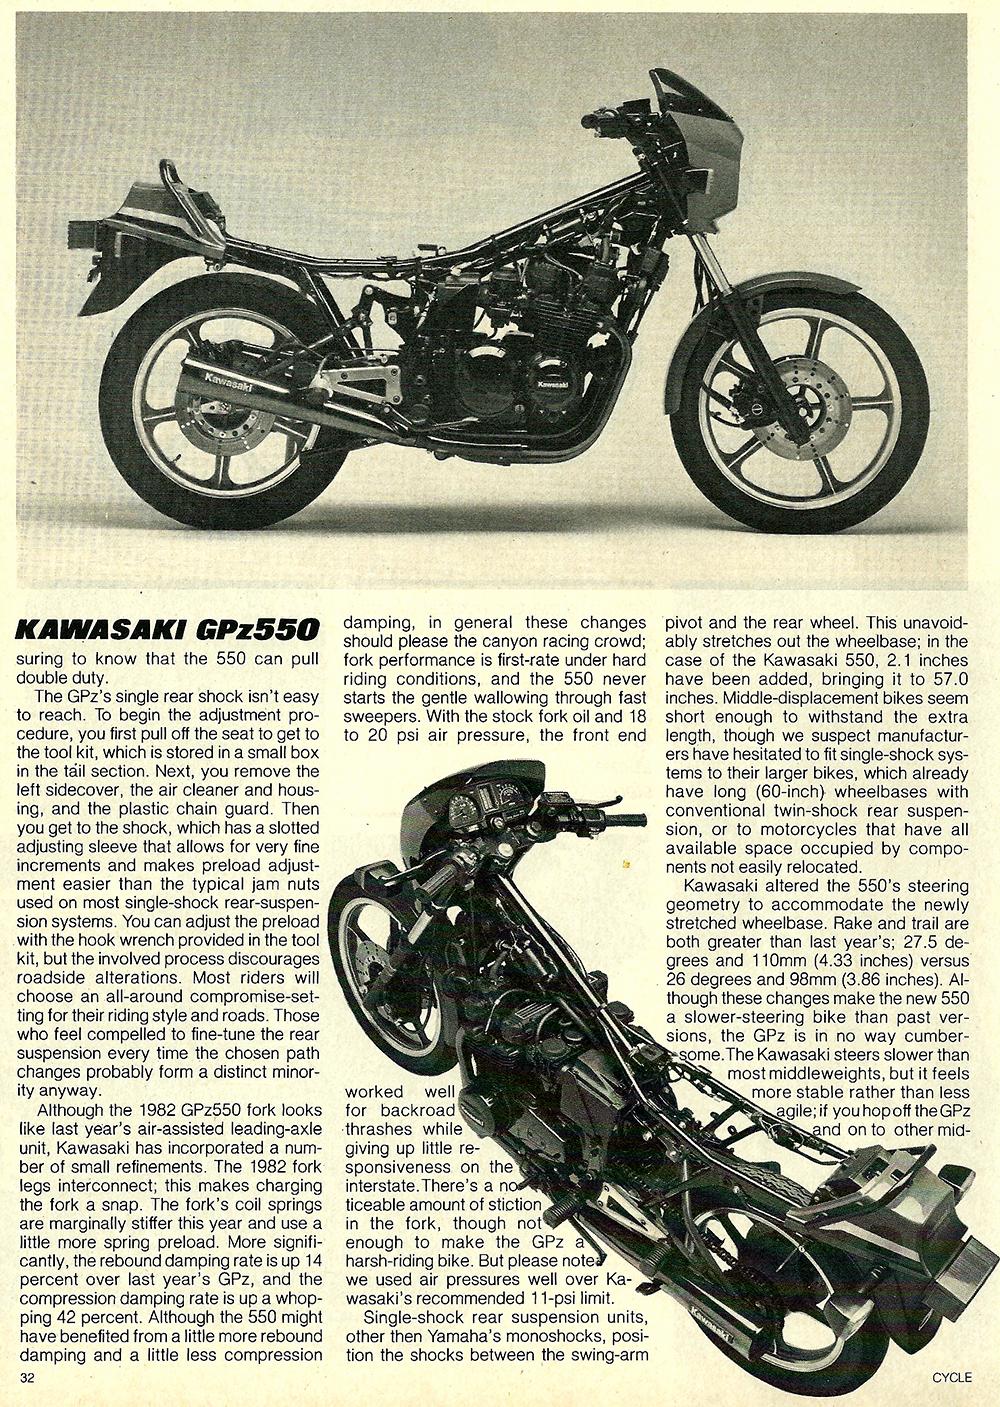 1982 Kawasaki GPz550 road test 05.jpg